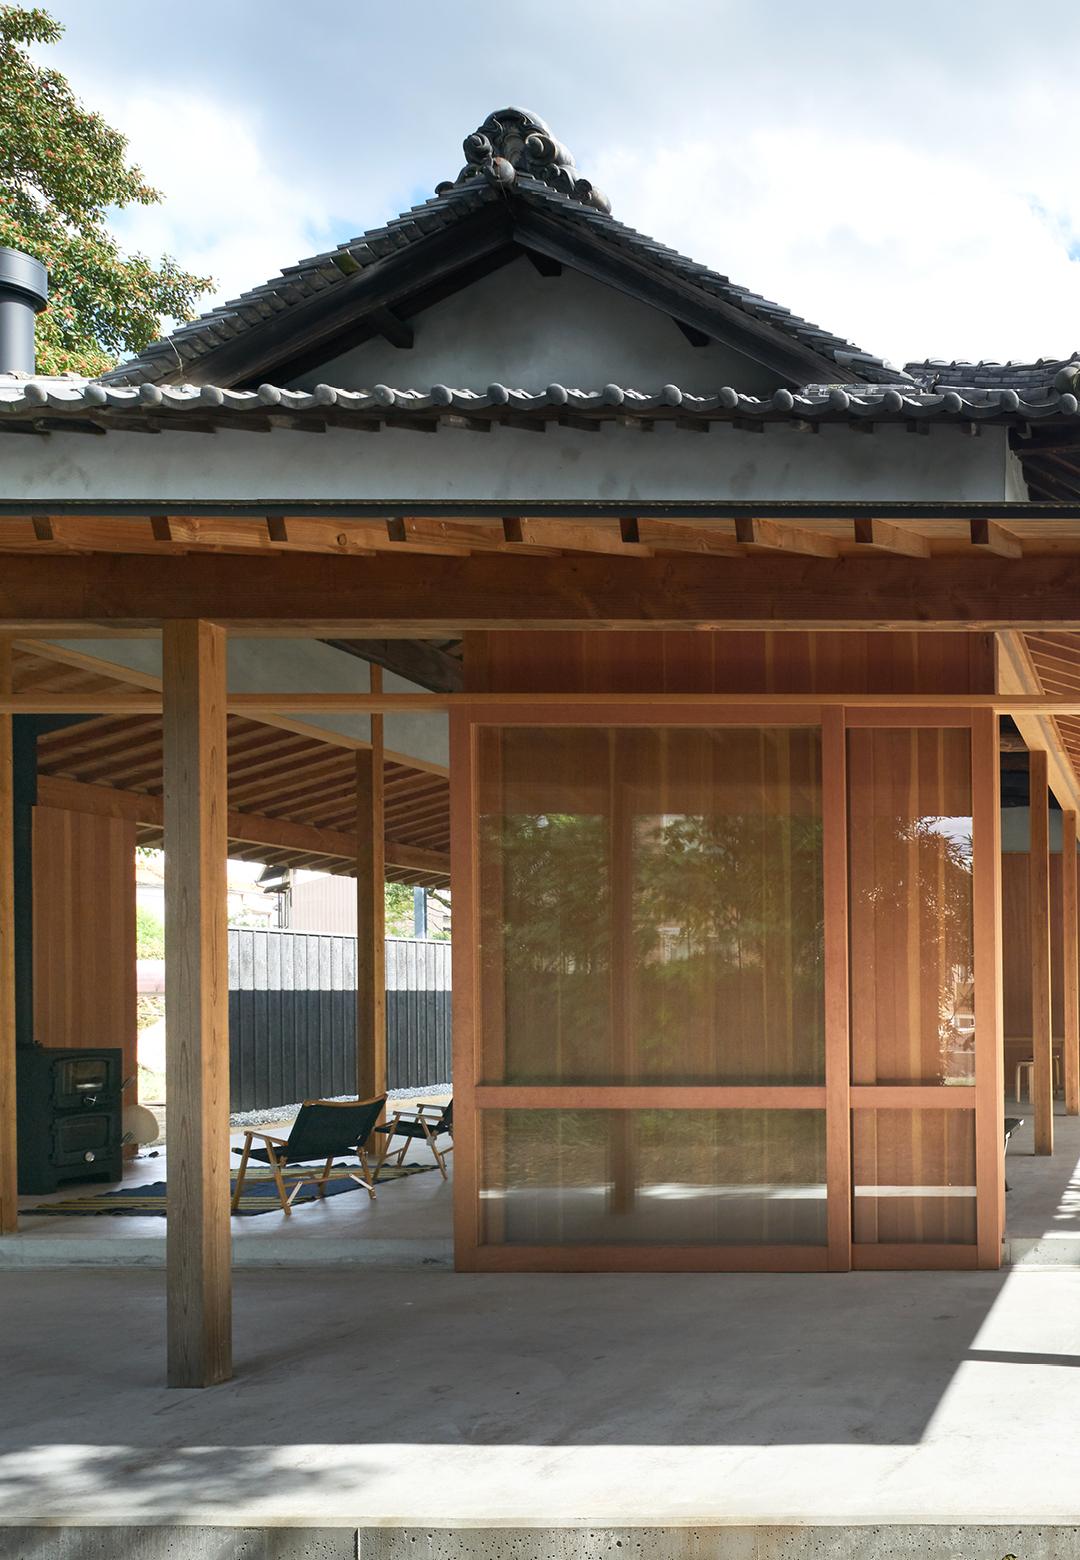 AR House award winner: House in Kamitomii by General Design Co.